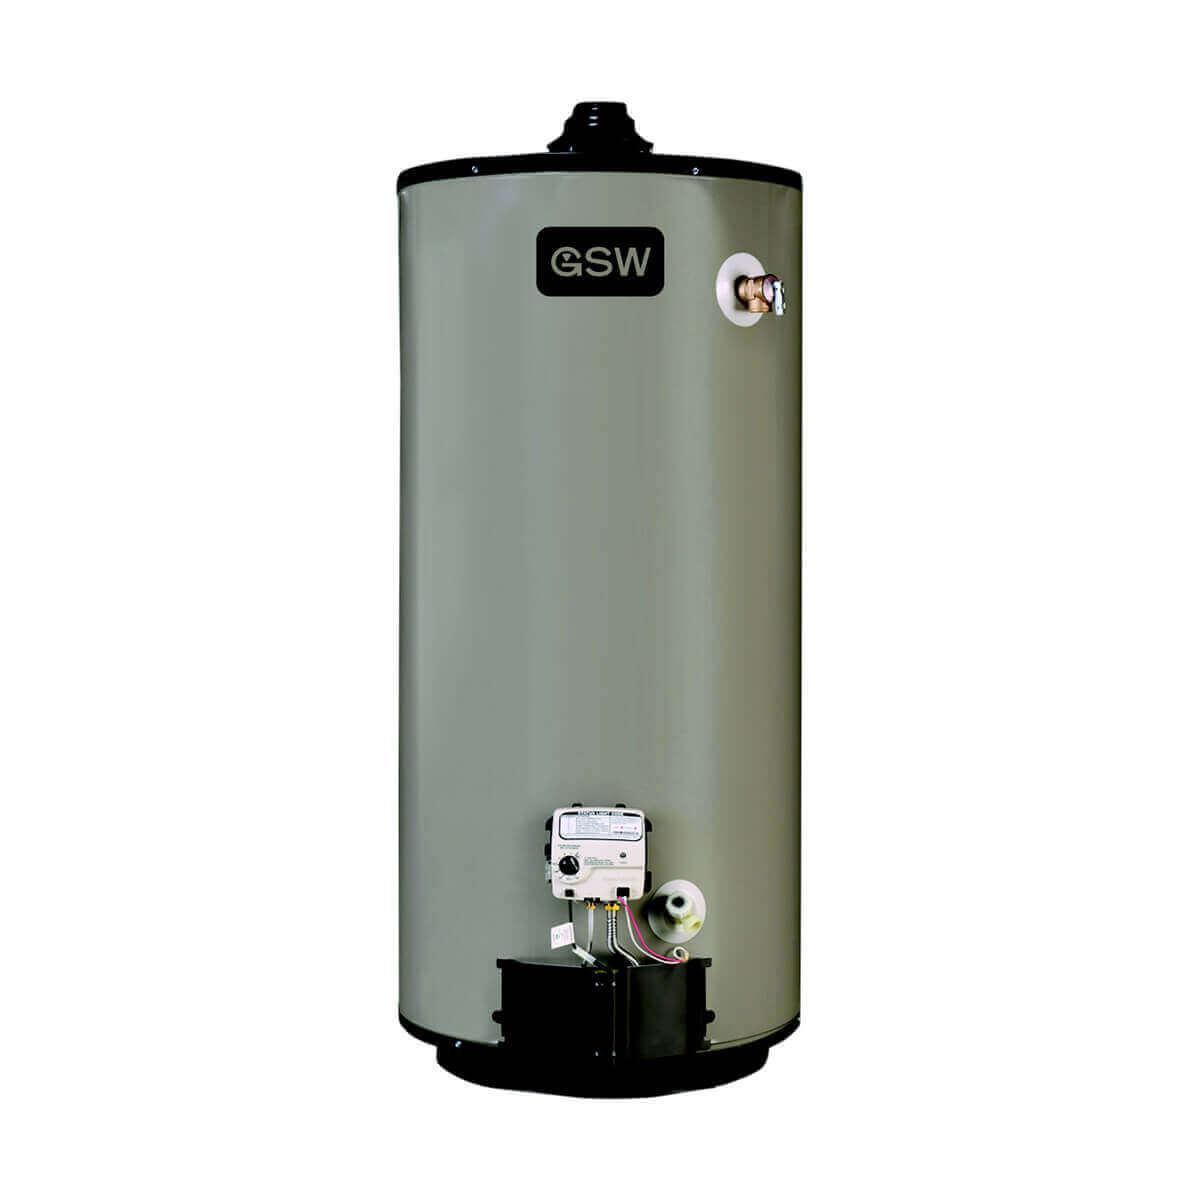 40 Gal. Natural Gas Hot Water Heater  - B4676